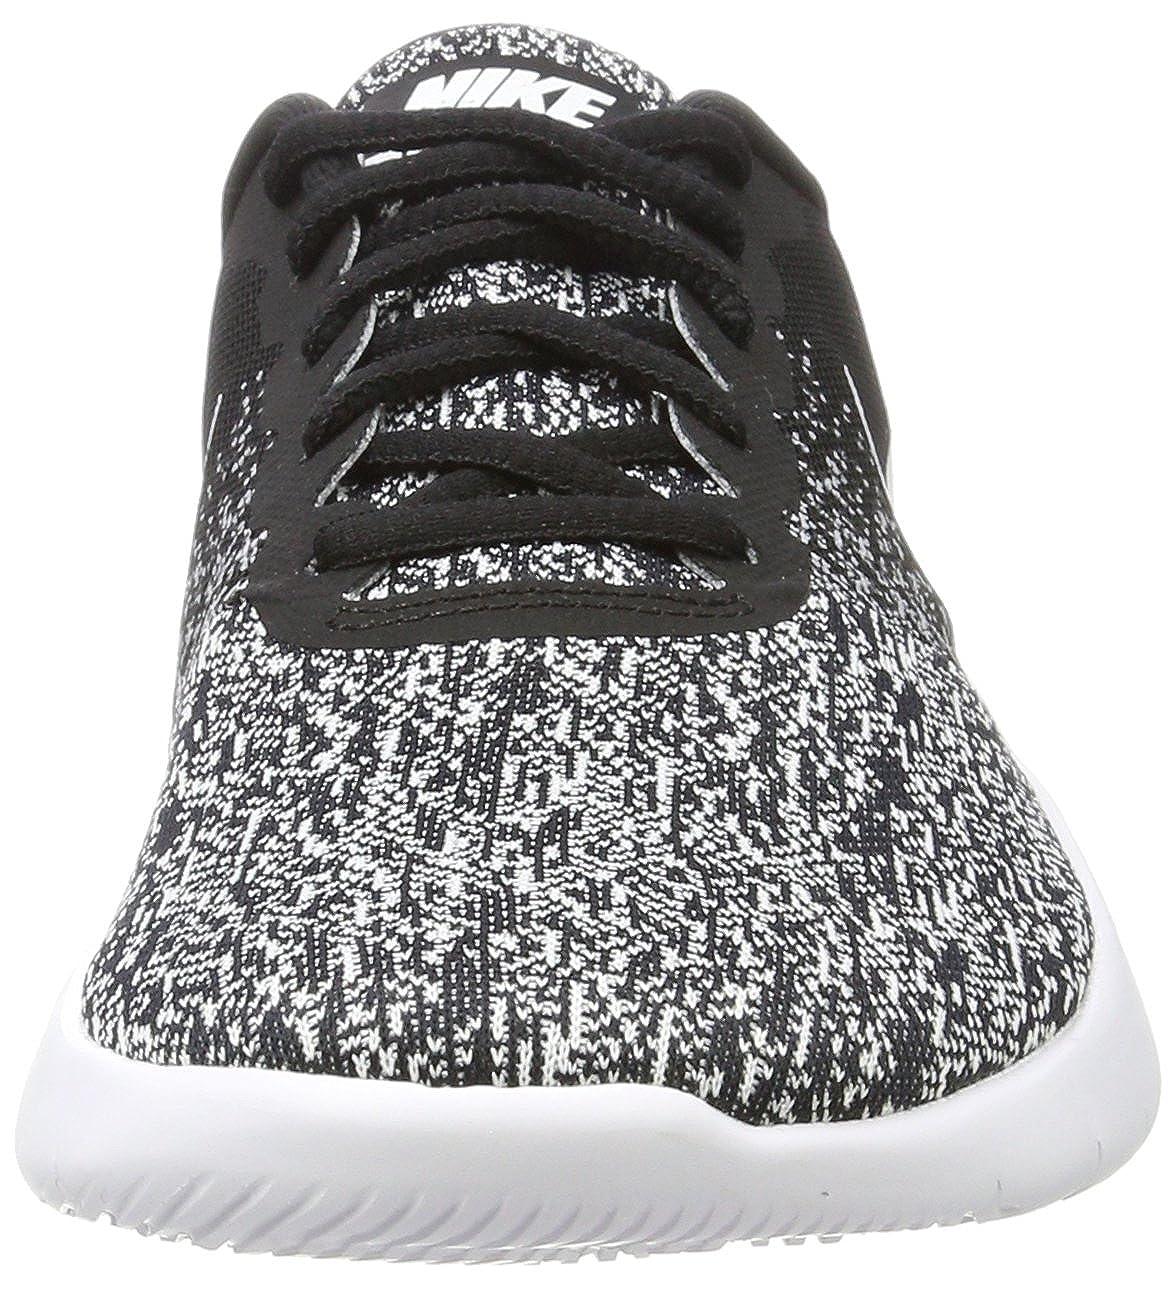 Nike Mens Flex Contact Running Shoes Black White 9